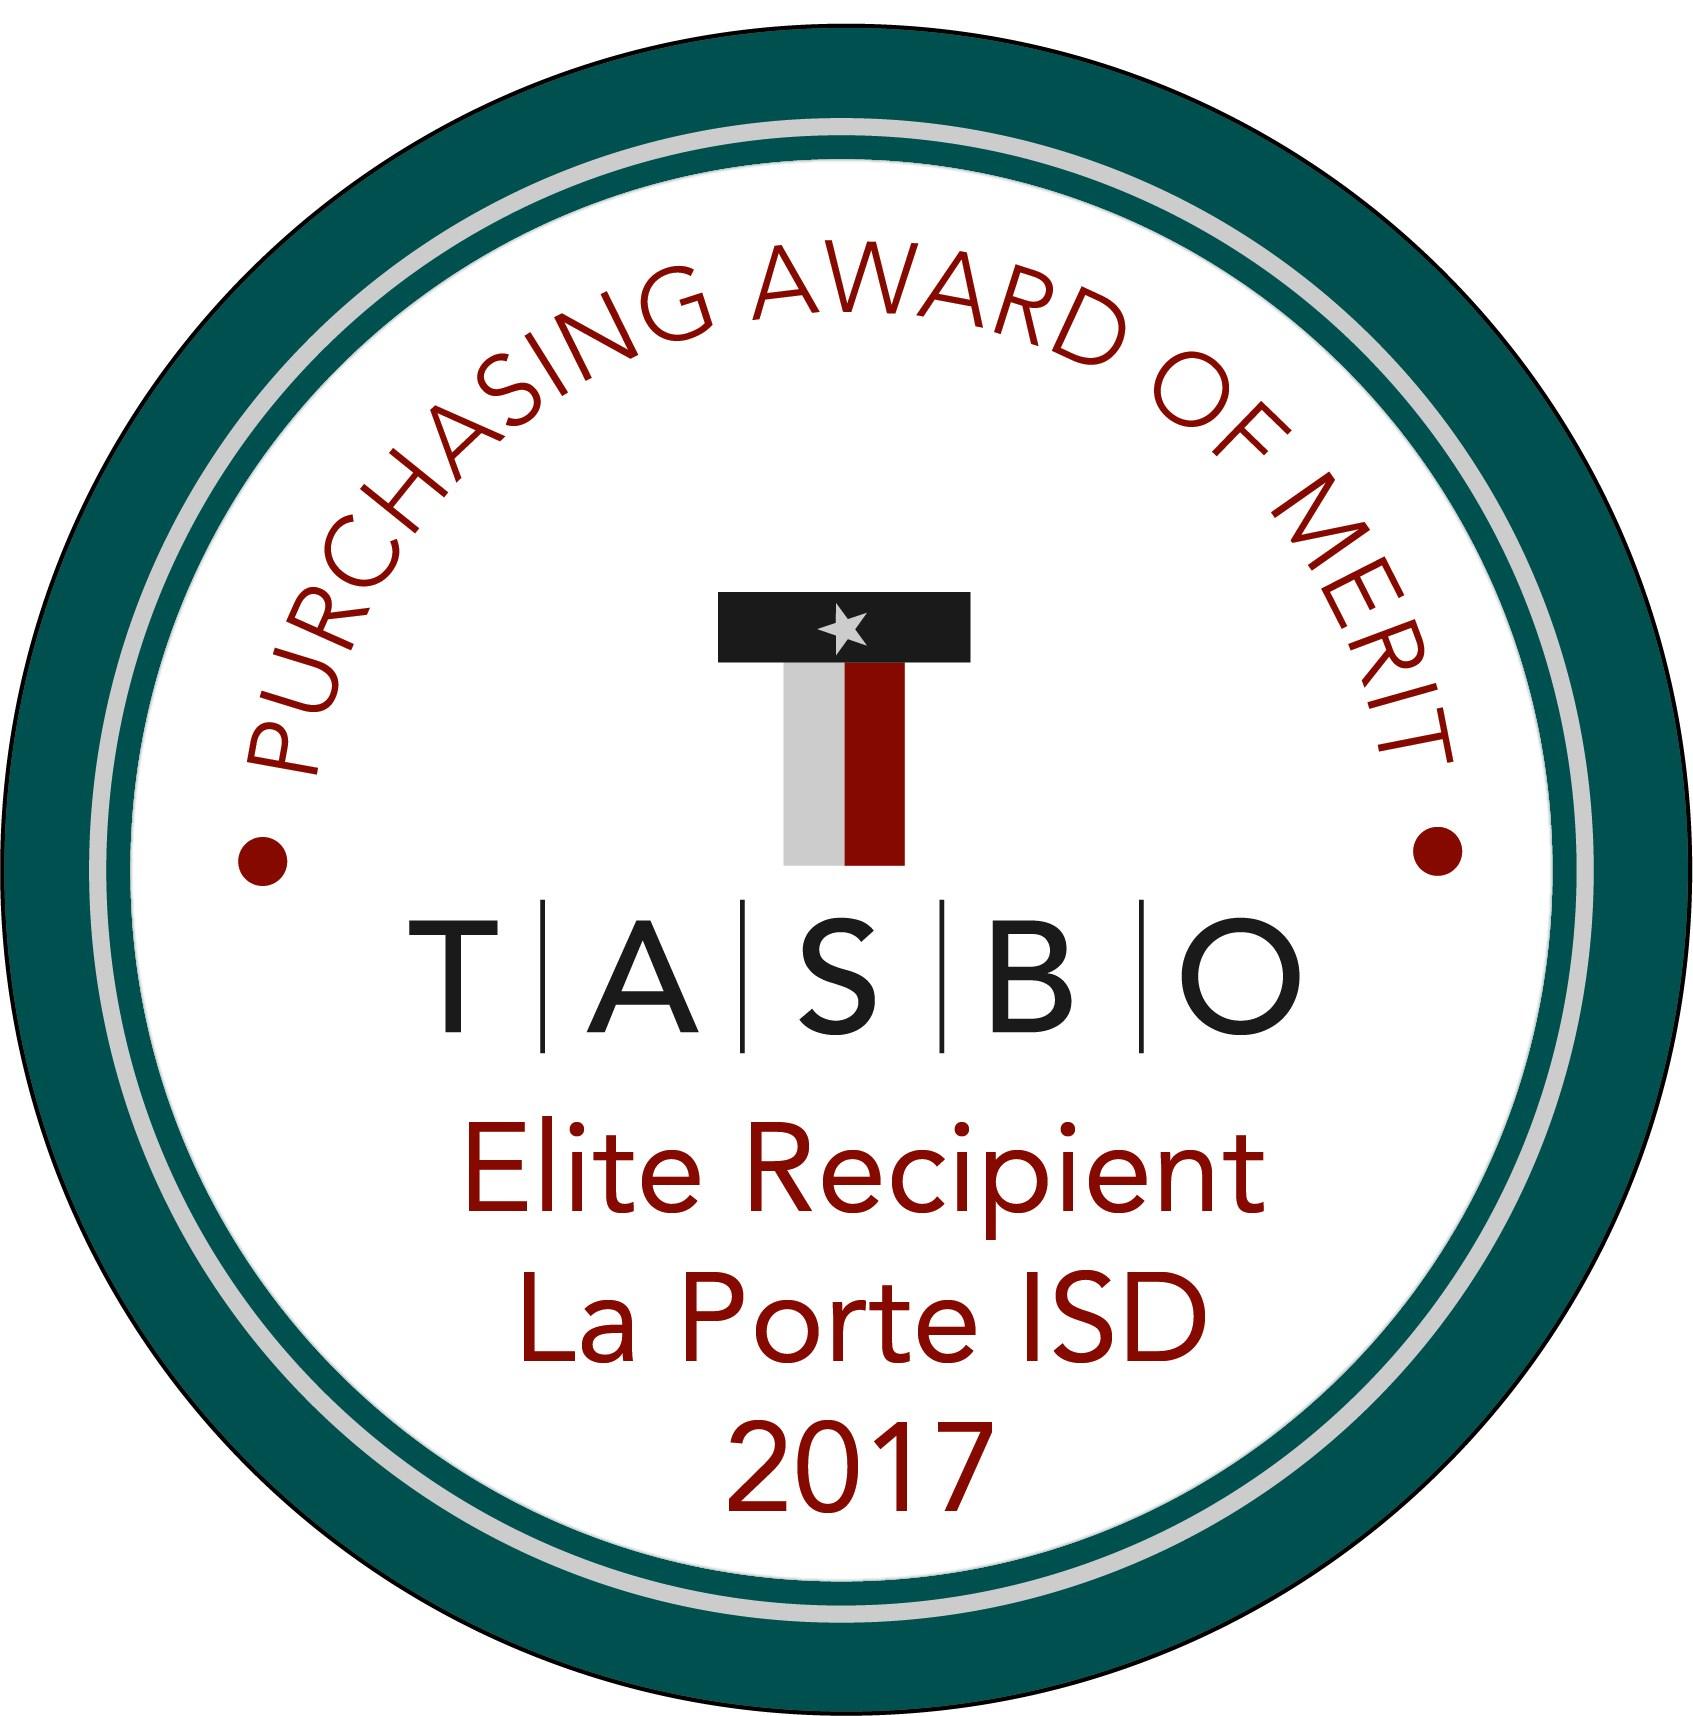 TASBO award: Purchasing Award of Merit 2017 Elite Recipient